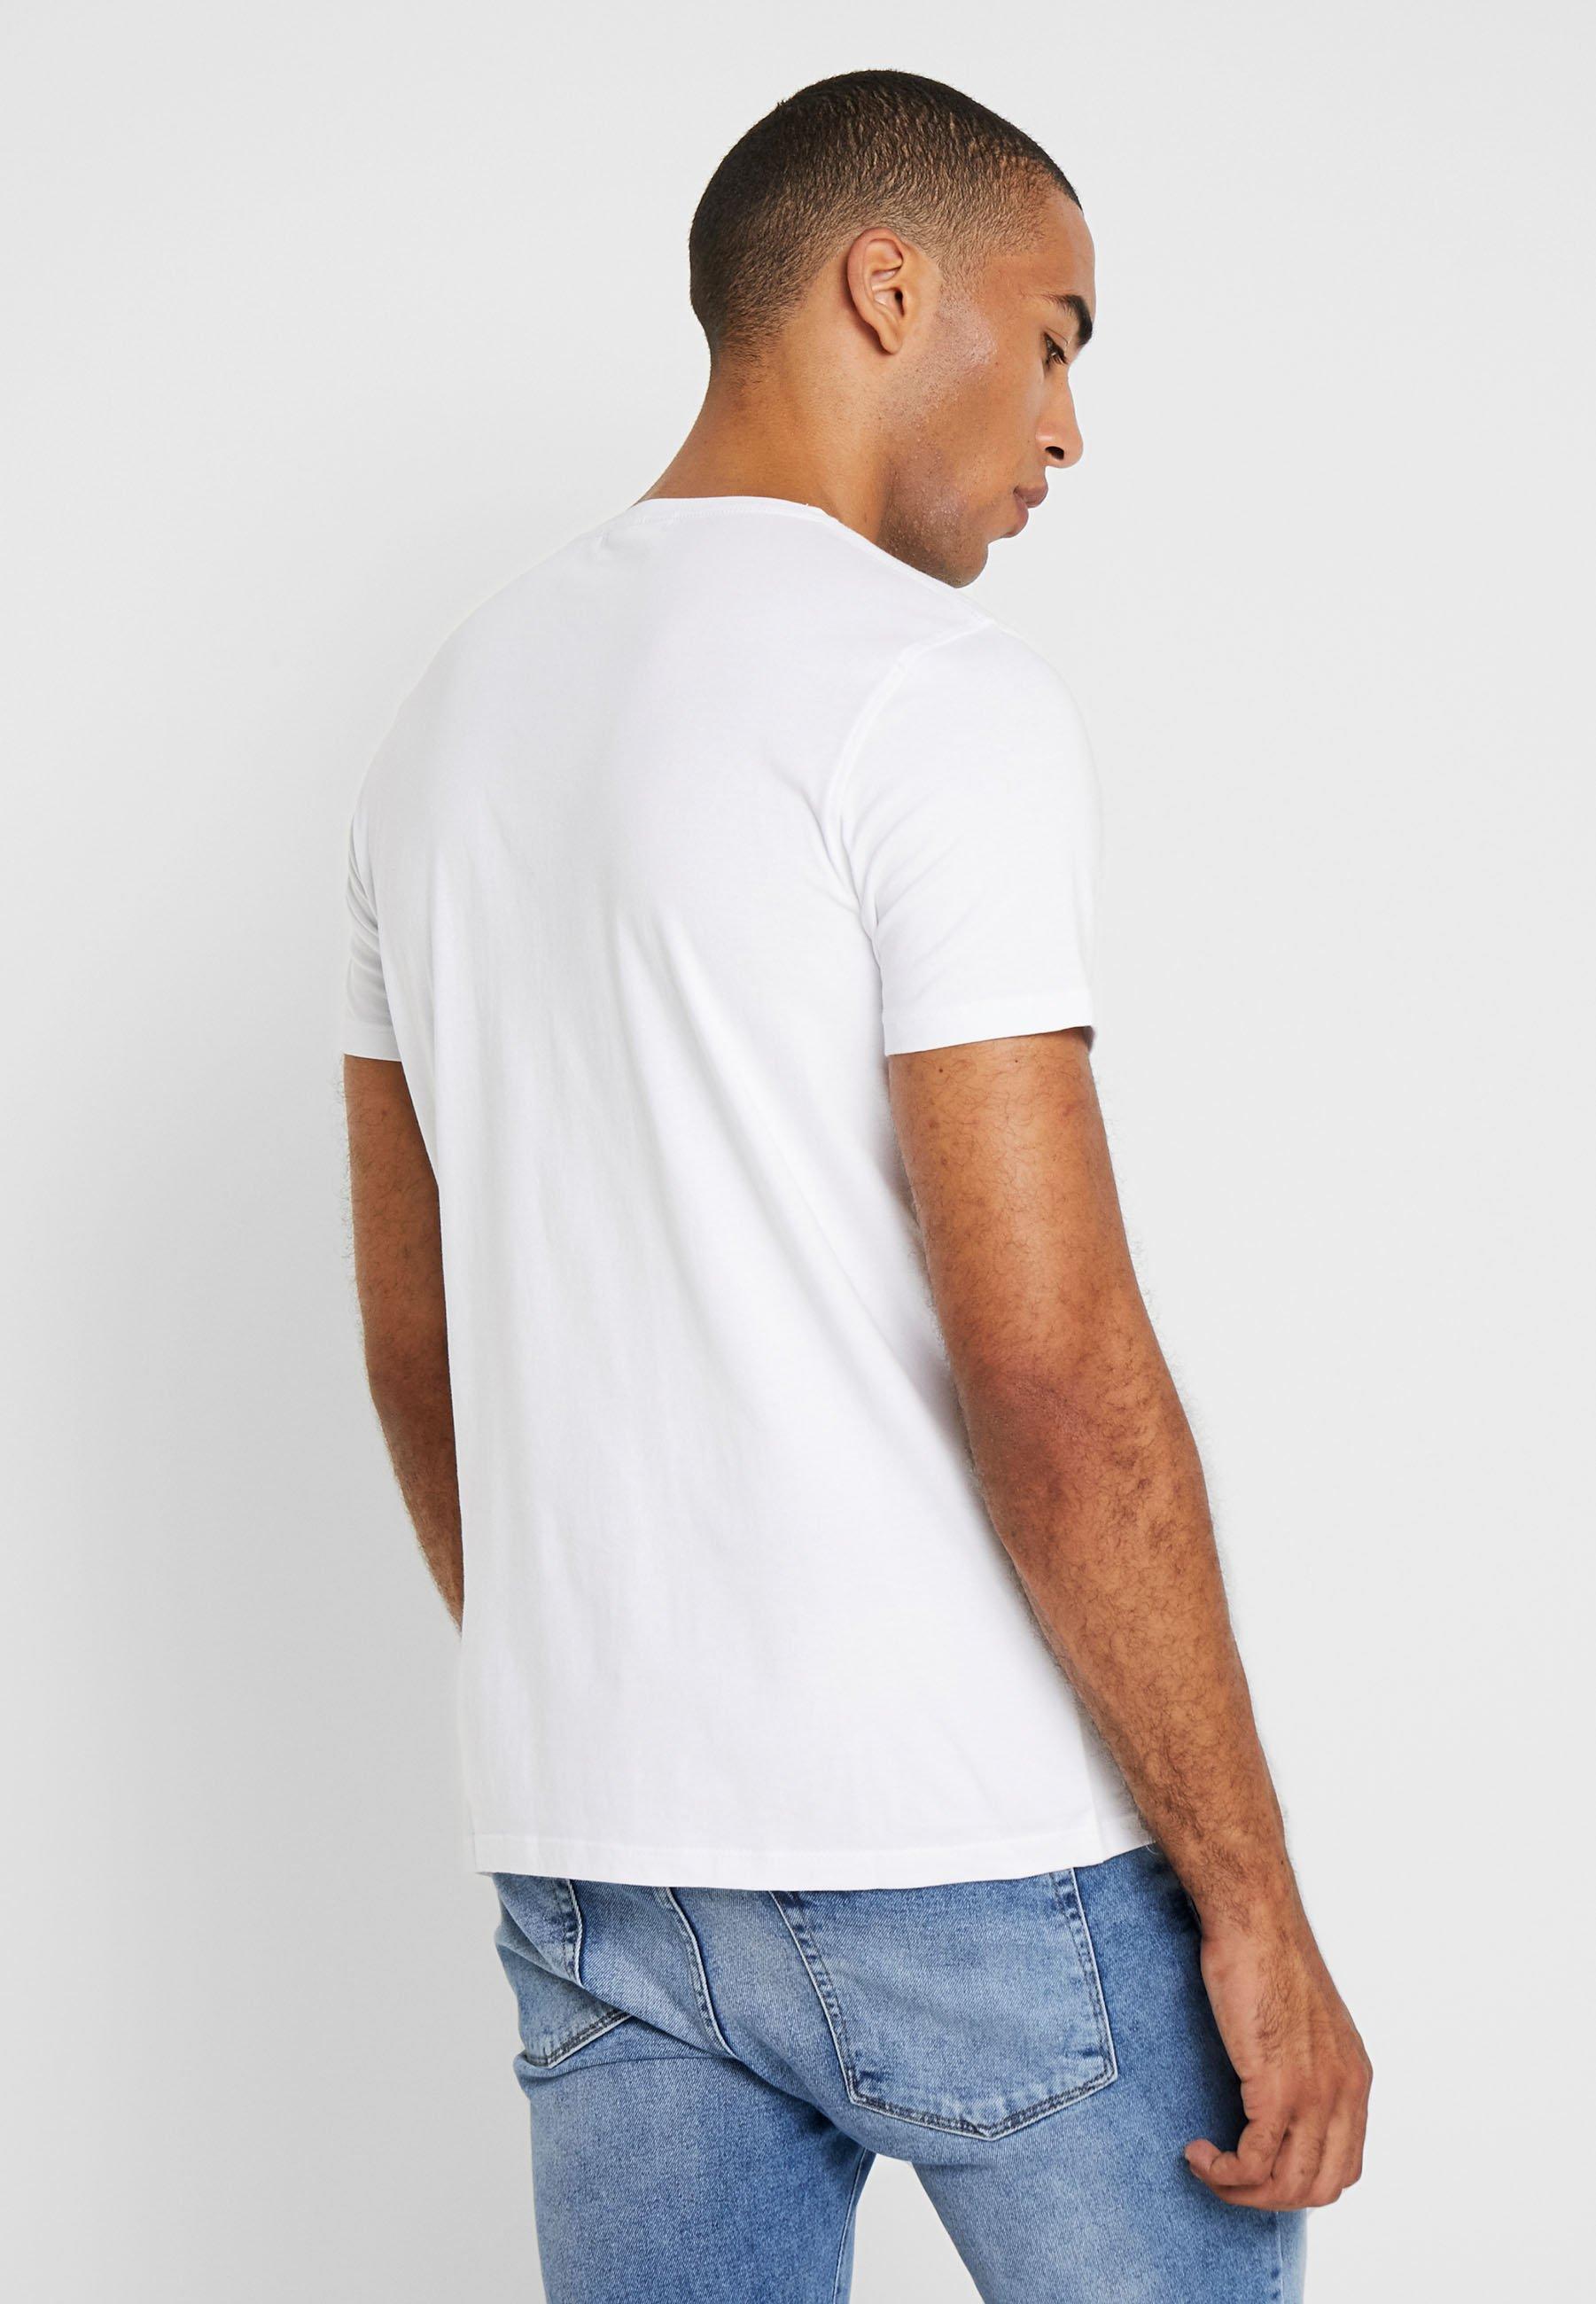 shirt Imprimé White Imprimé Lindbergh PrideT Lindbergh PrideT White Lindbergh shirt Imprimé shirt PrideT CxorWdEQBe